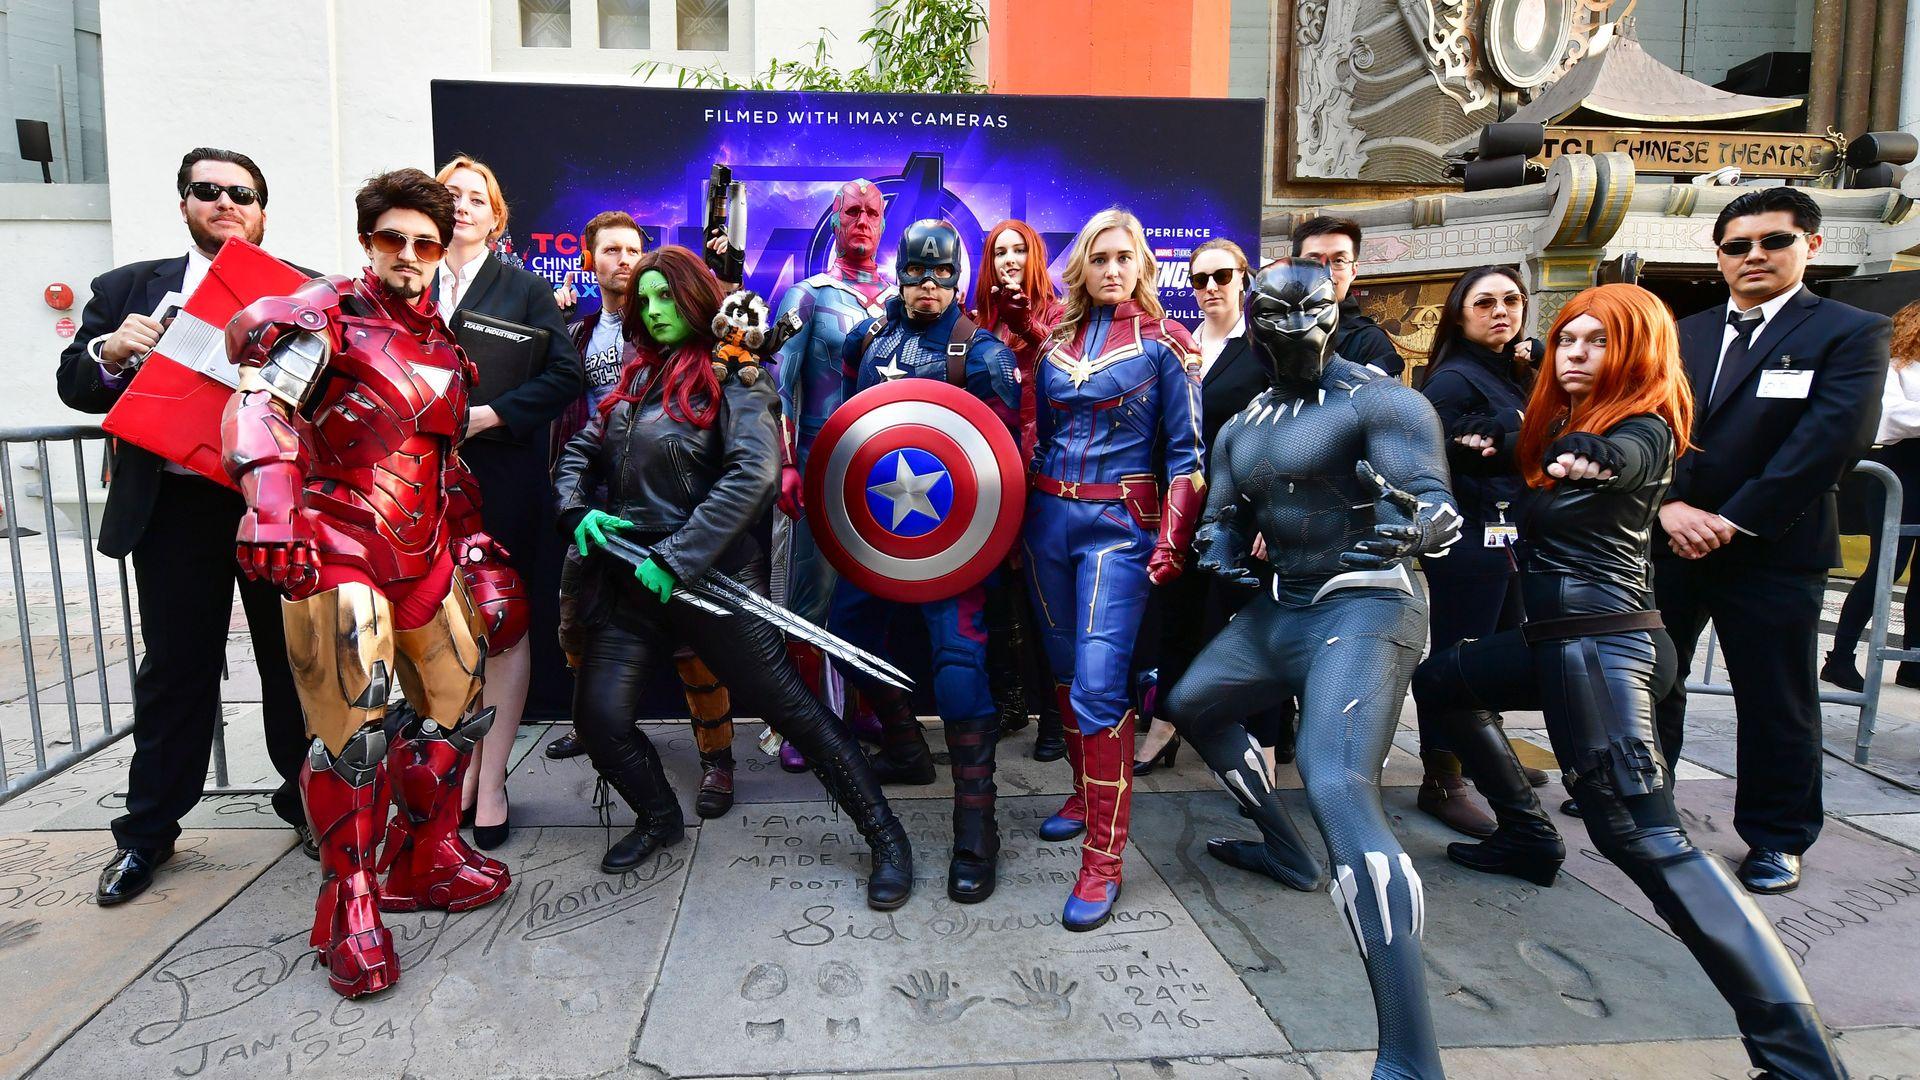 3. 1 Avengers thing